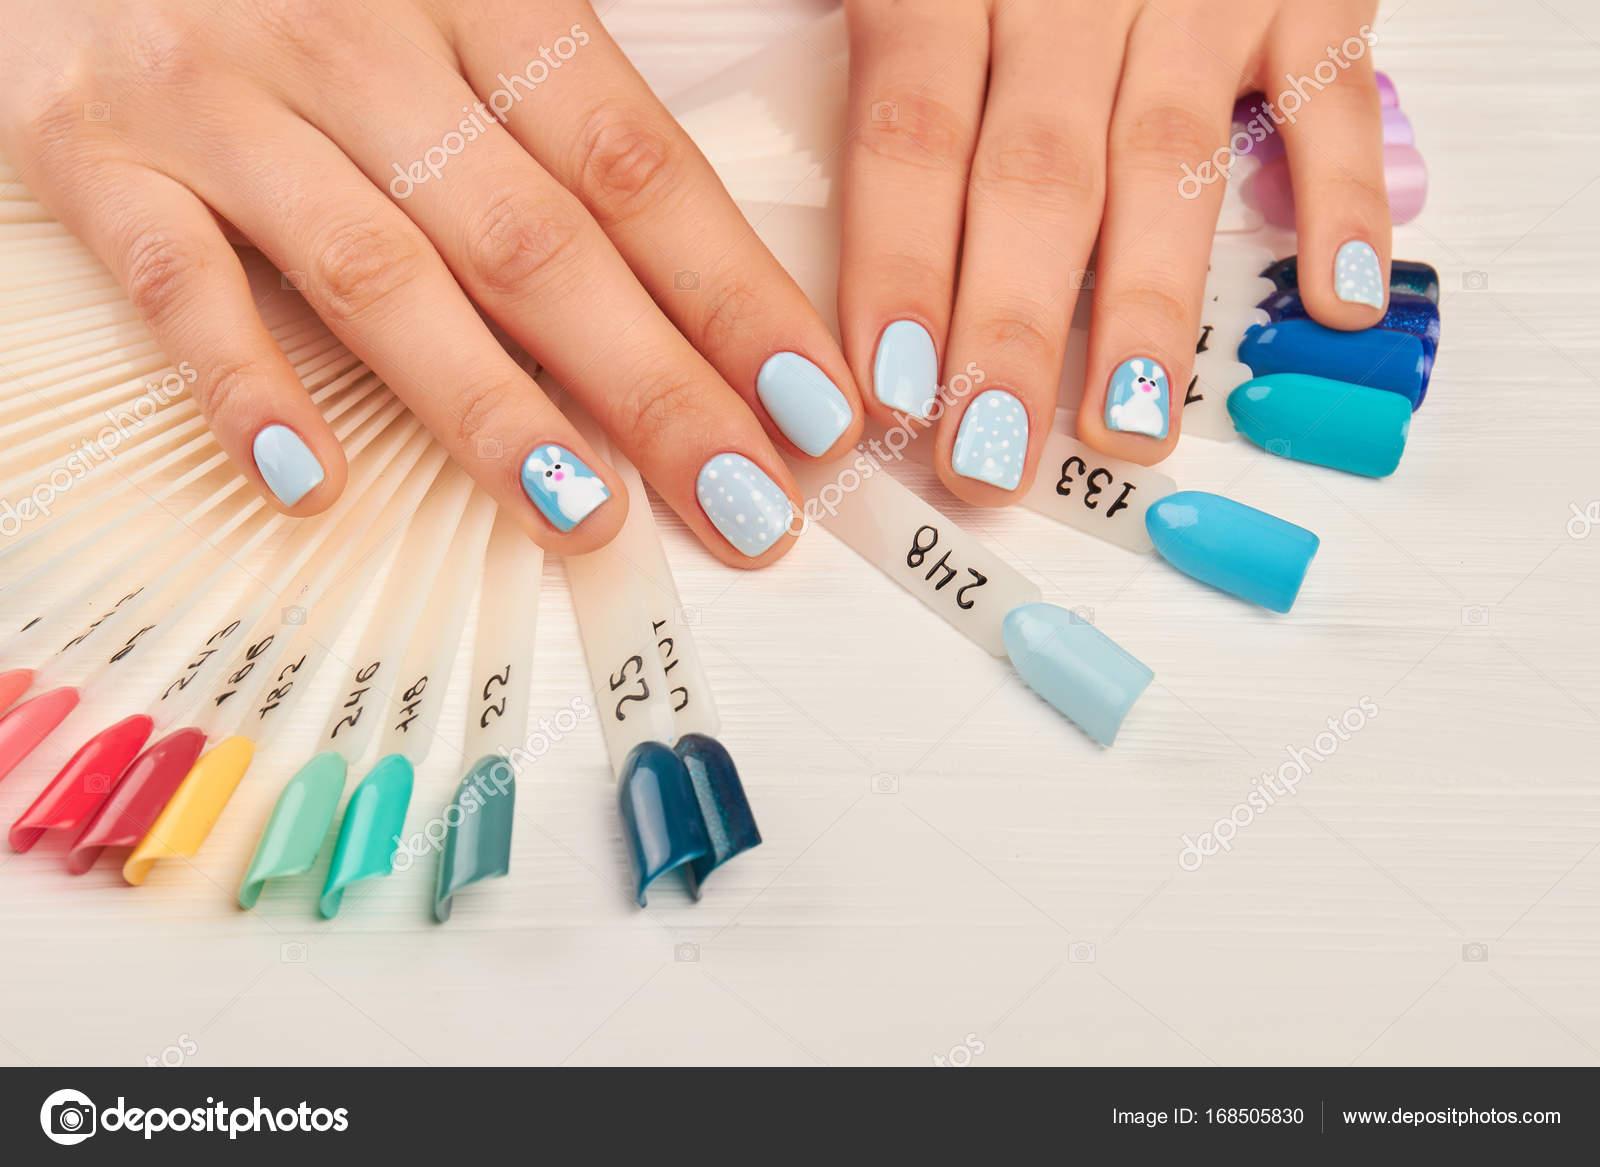 Gepflegte Hände und Nägel Farbmuster — Stockfoto © Denisfilm #168505830